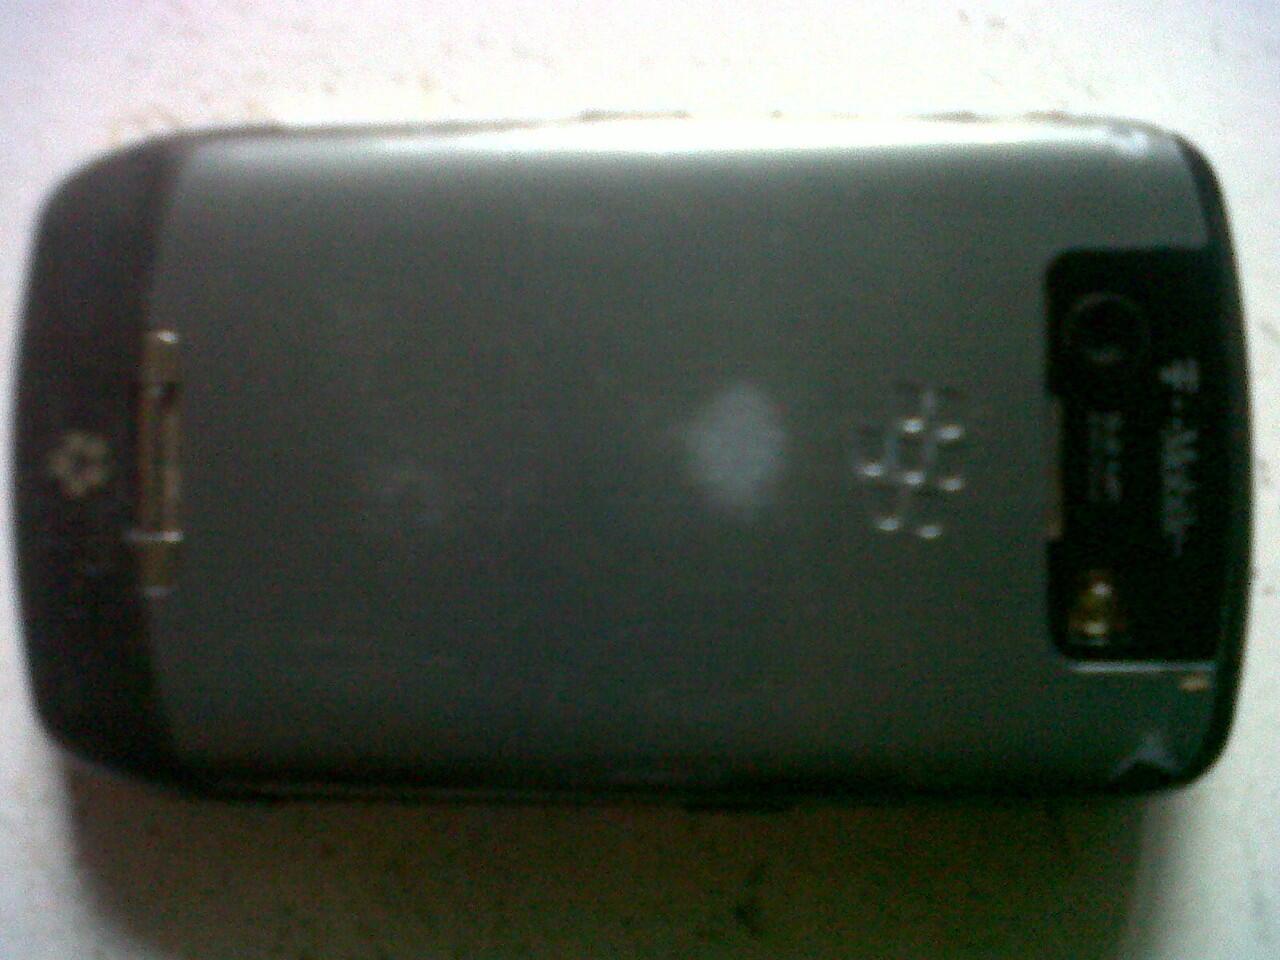 jual blackberry javelin 8900 hitam